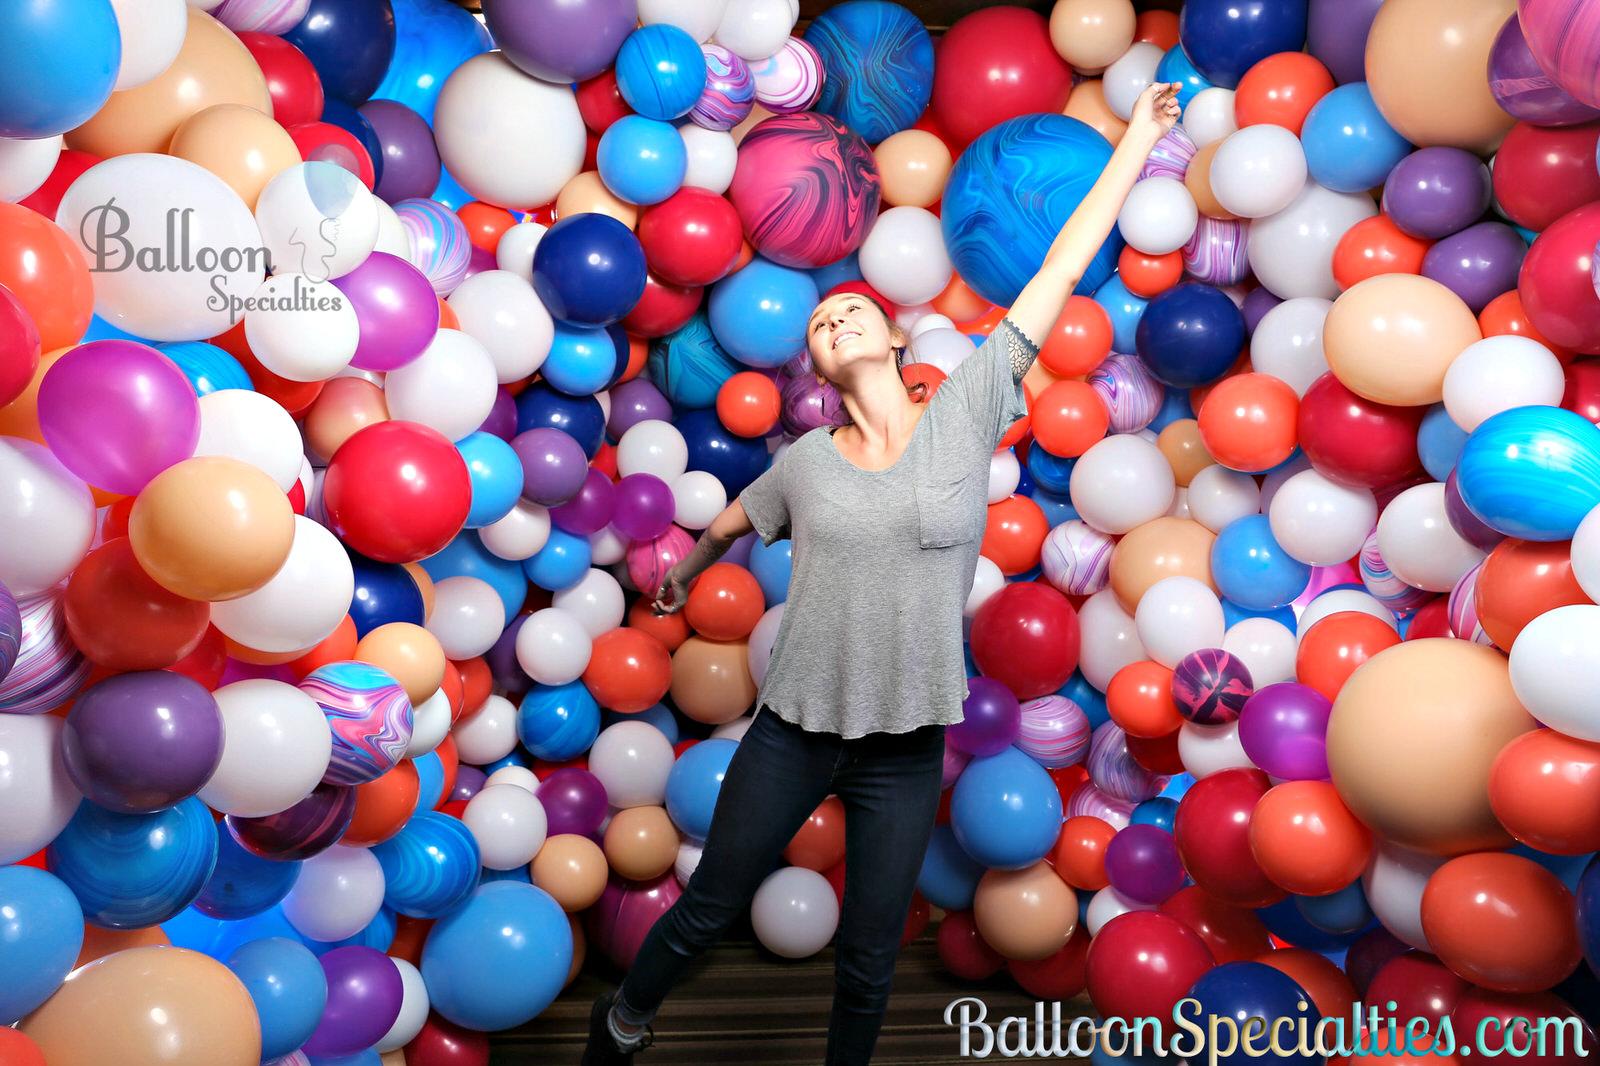 Branded Zim Balloon Specialties San Francisco Balloon Wall 180 degrees.jpg